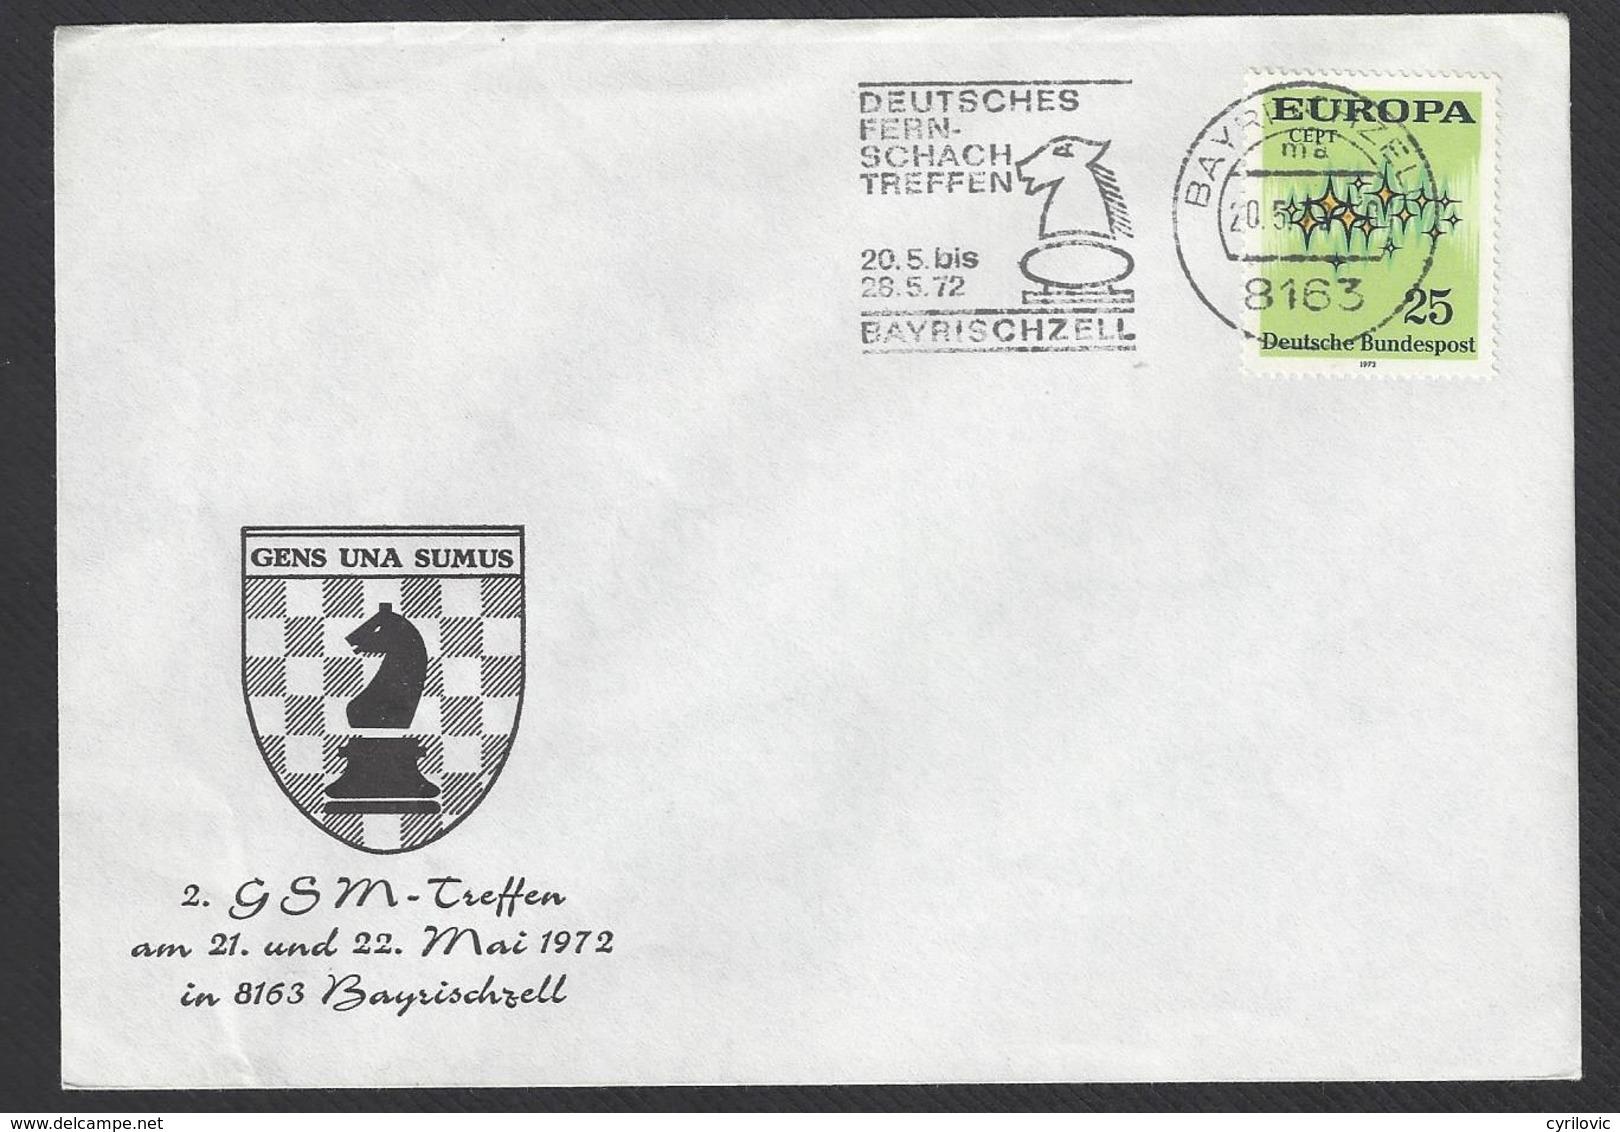 Chess, Germany Bayrischzell, 20.05.1972, Special Roller Type Cancel On Envelope, GSM Meeting - Schaken